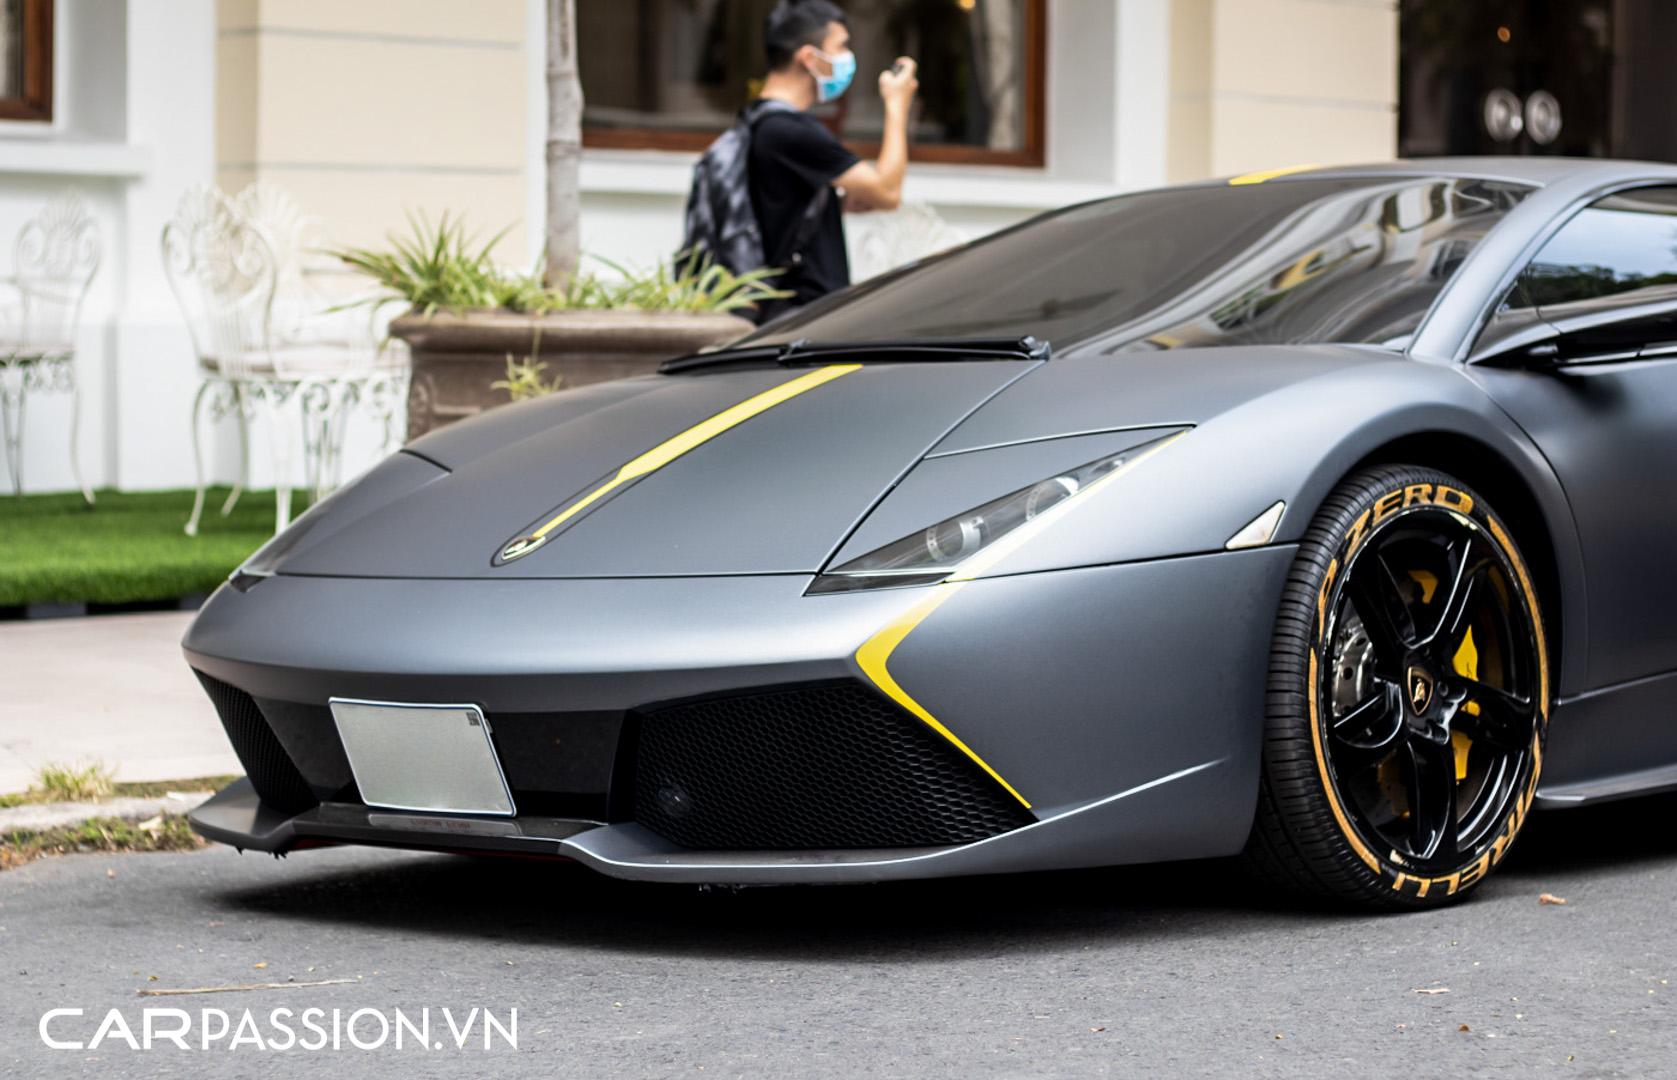 Lamborghini Murcielago đen mờ (4).JPG